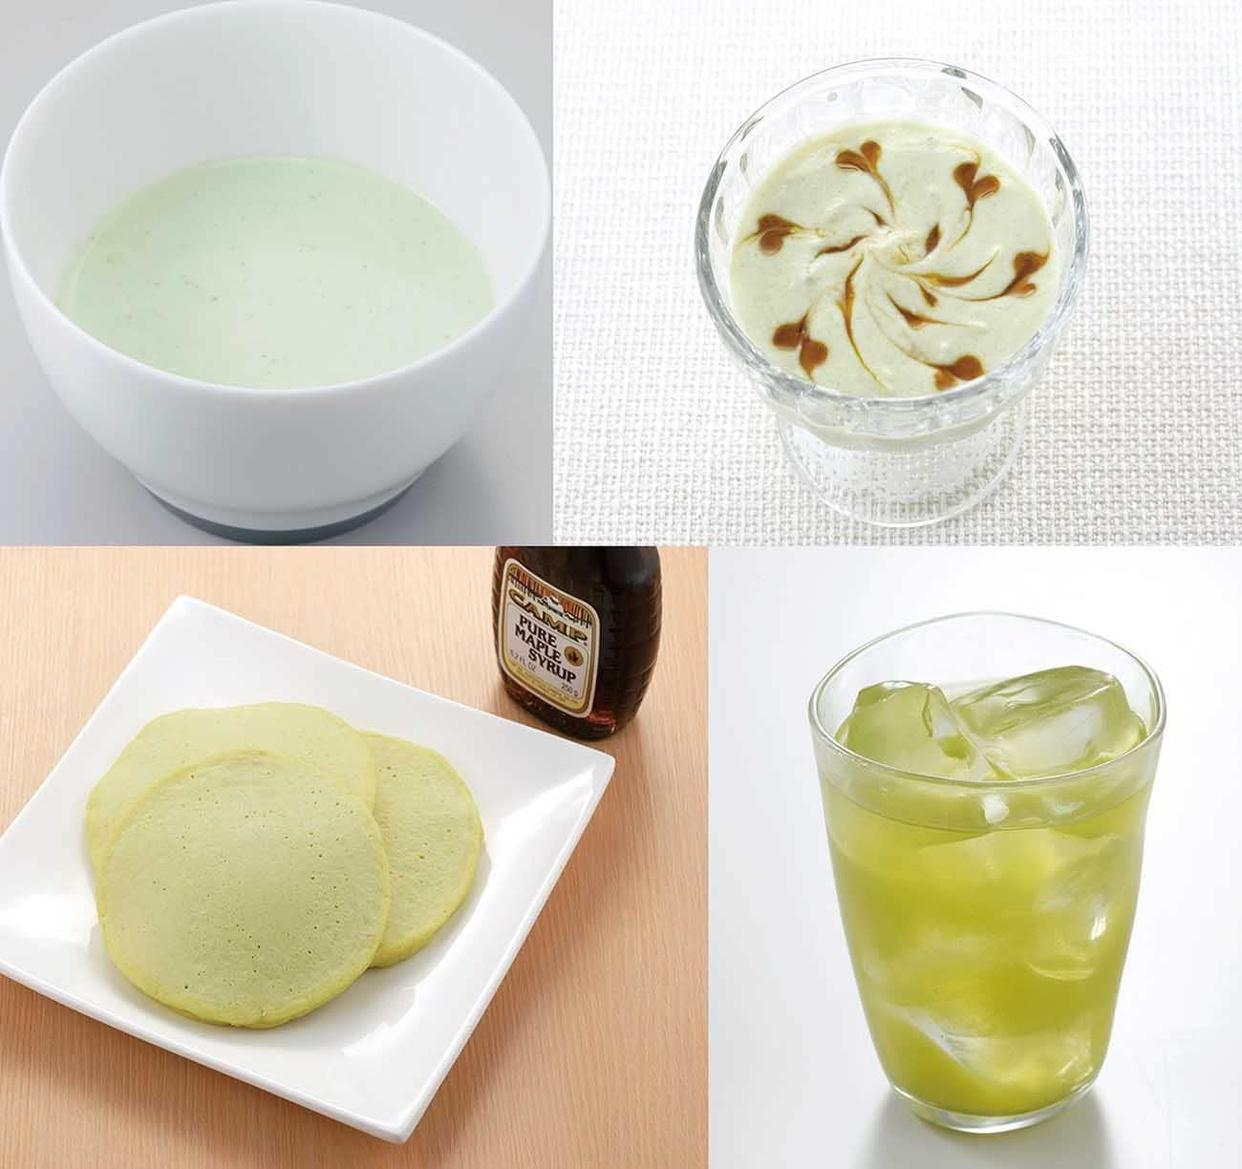 Arnest(アーネスト) お茶挽き香房の商品画像6